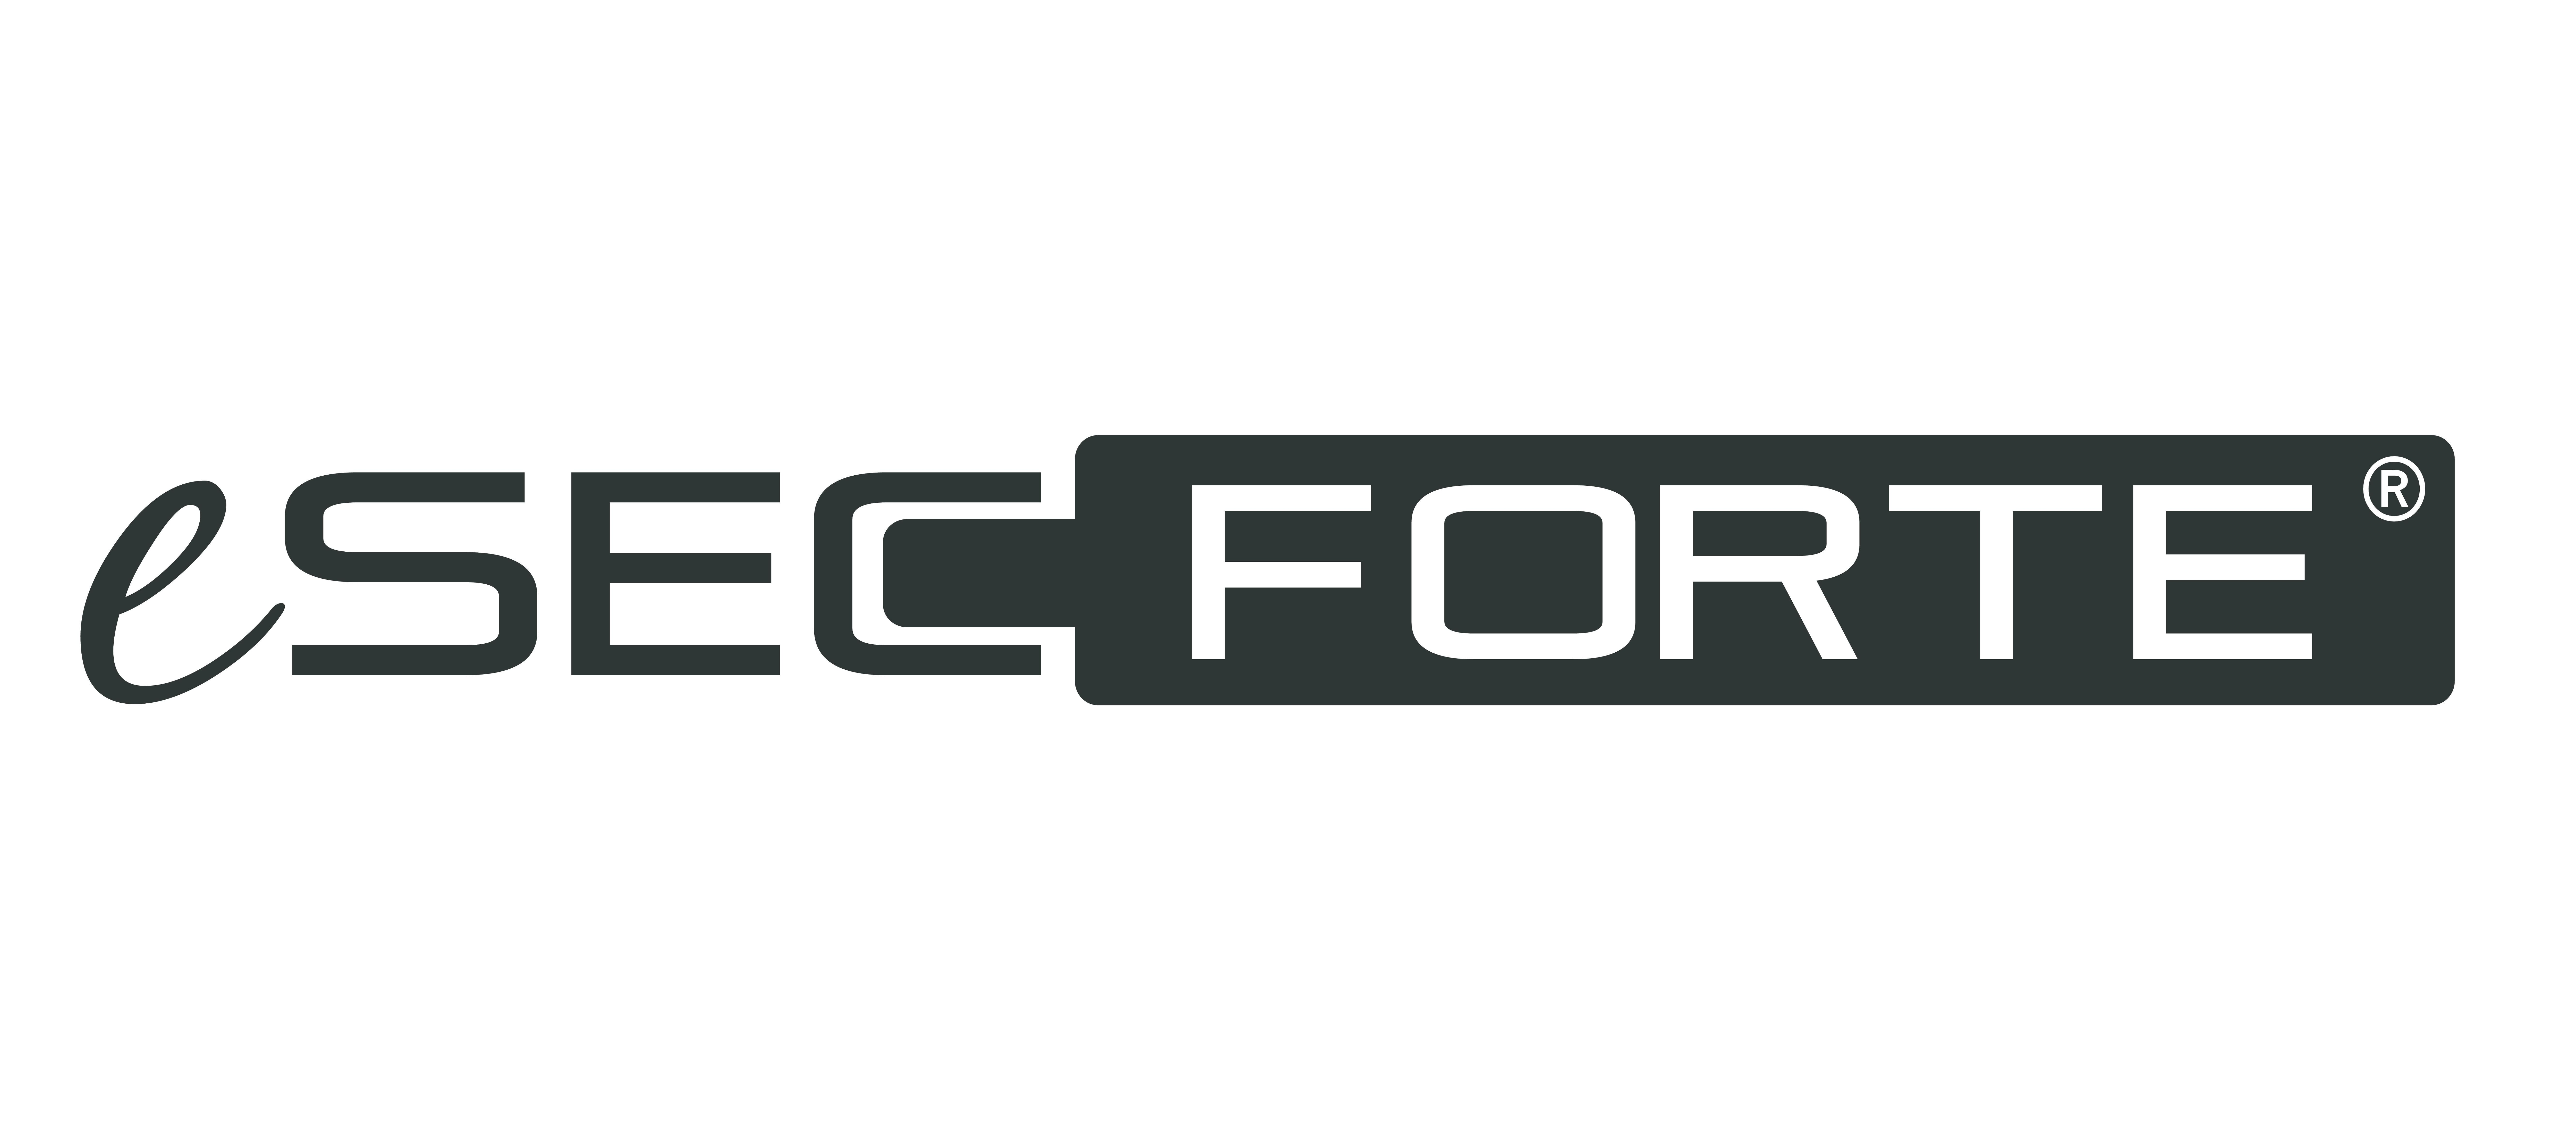 esecforte-logo